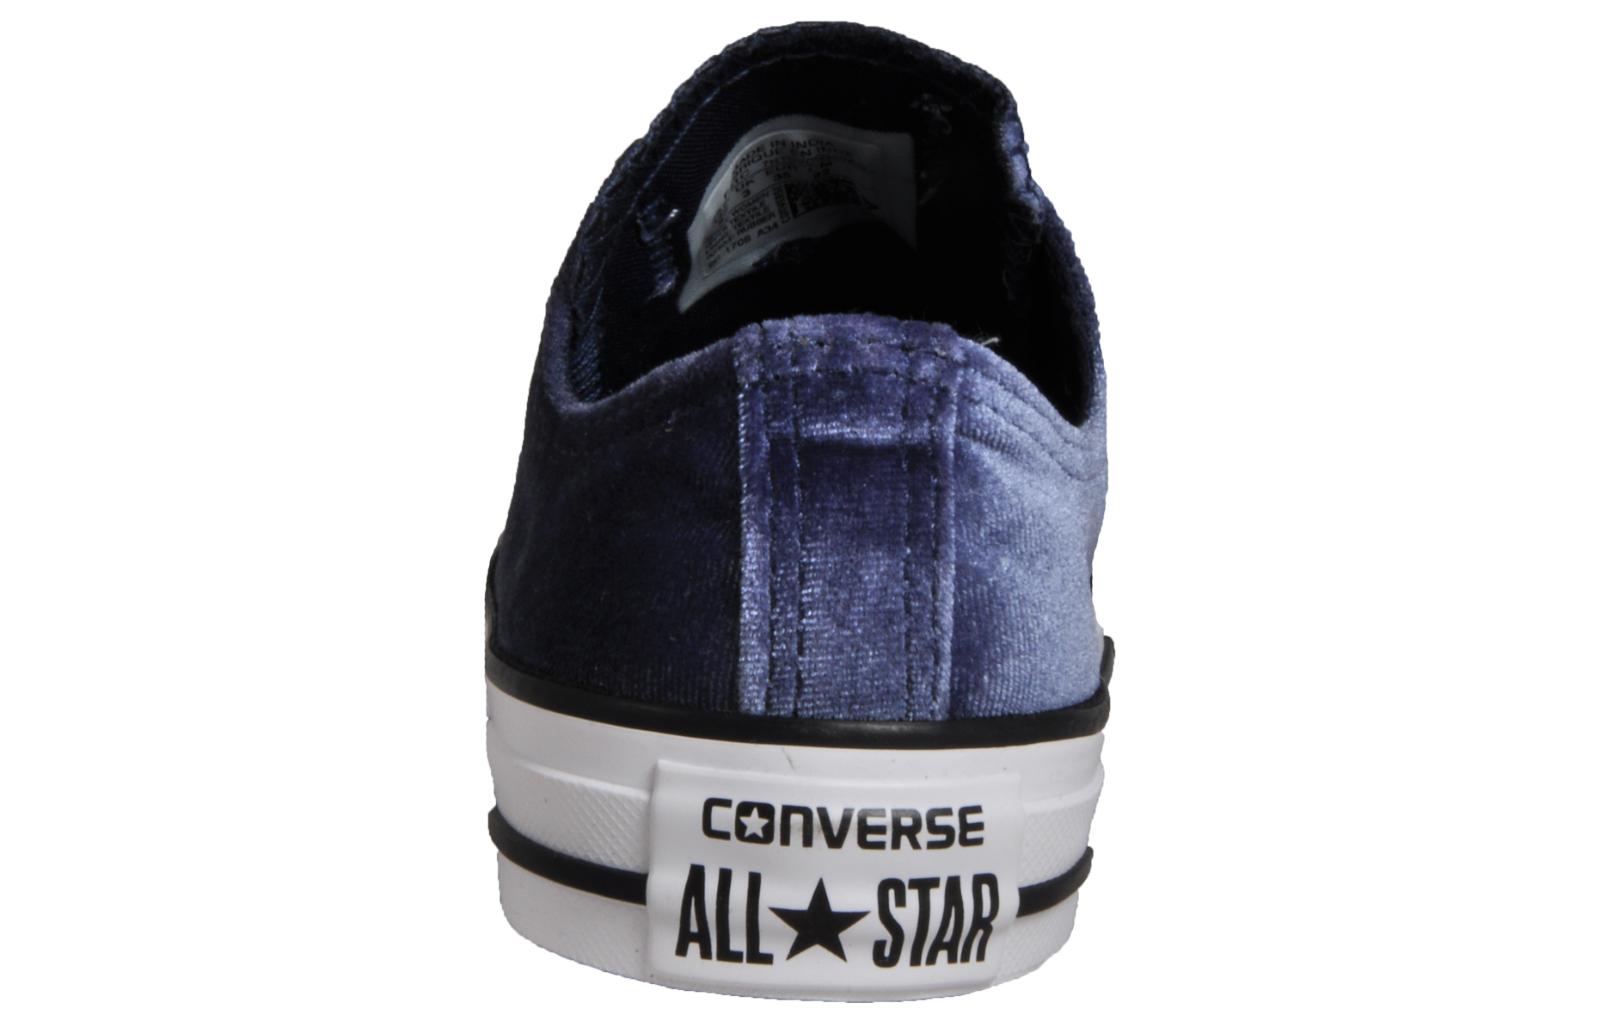 8320b98b5464 Converse CT All Star Velvet OX Womens Girls - CN163036. alternate view 2.  alternate view 1. alternate view 1